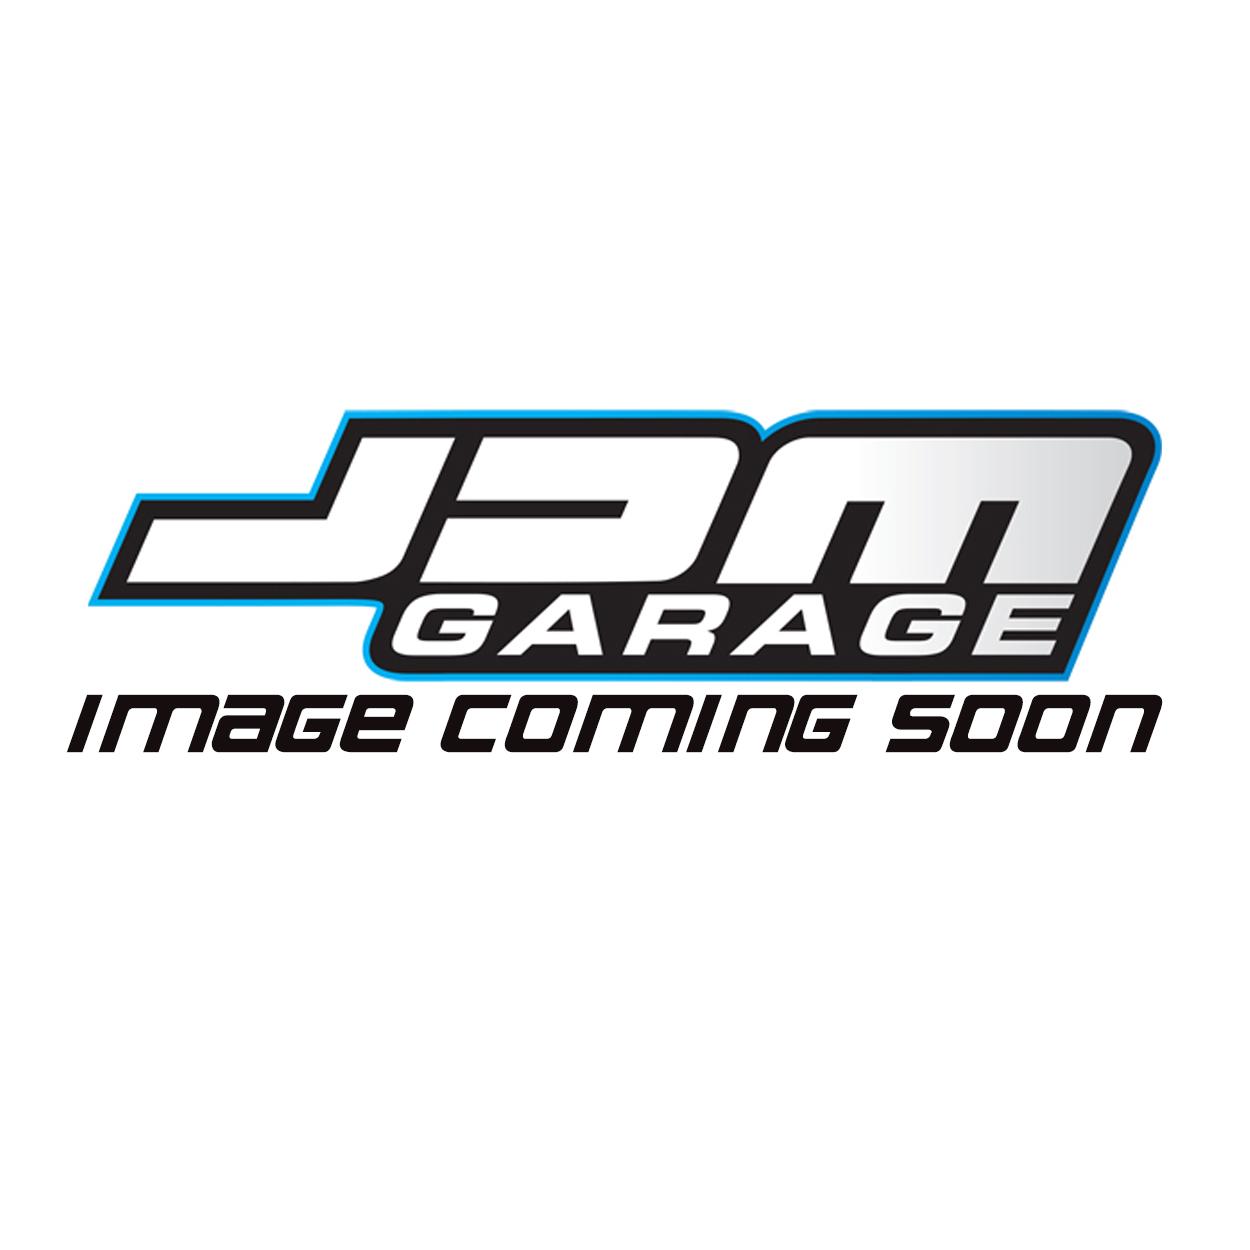 Oil Cooler - Nissan - R32 R33 R34 Skyline / S13 S14 S15 Silvia / Pulsar GTIR / 350Z 370Z